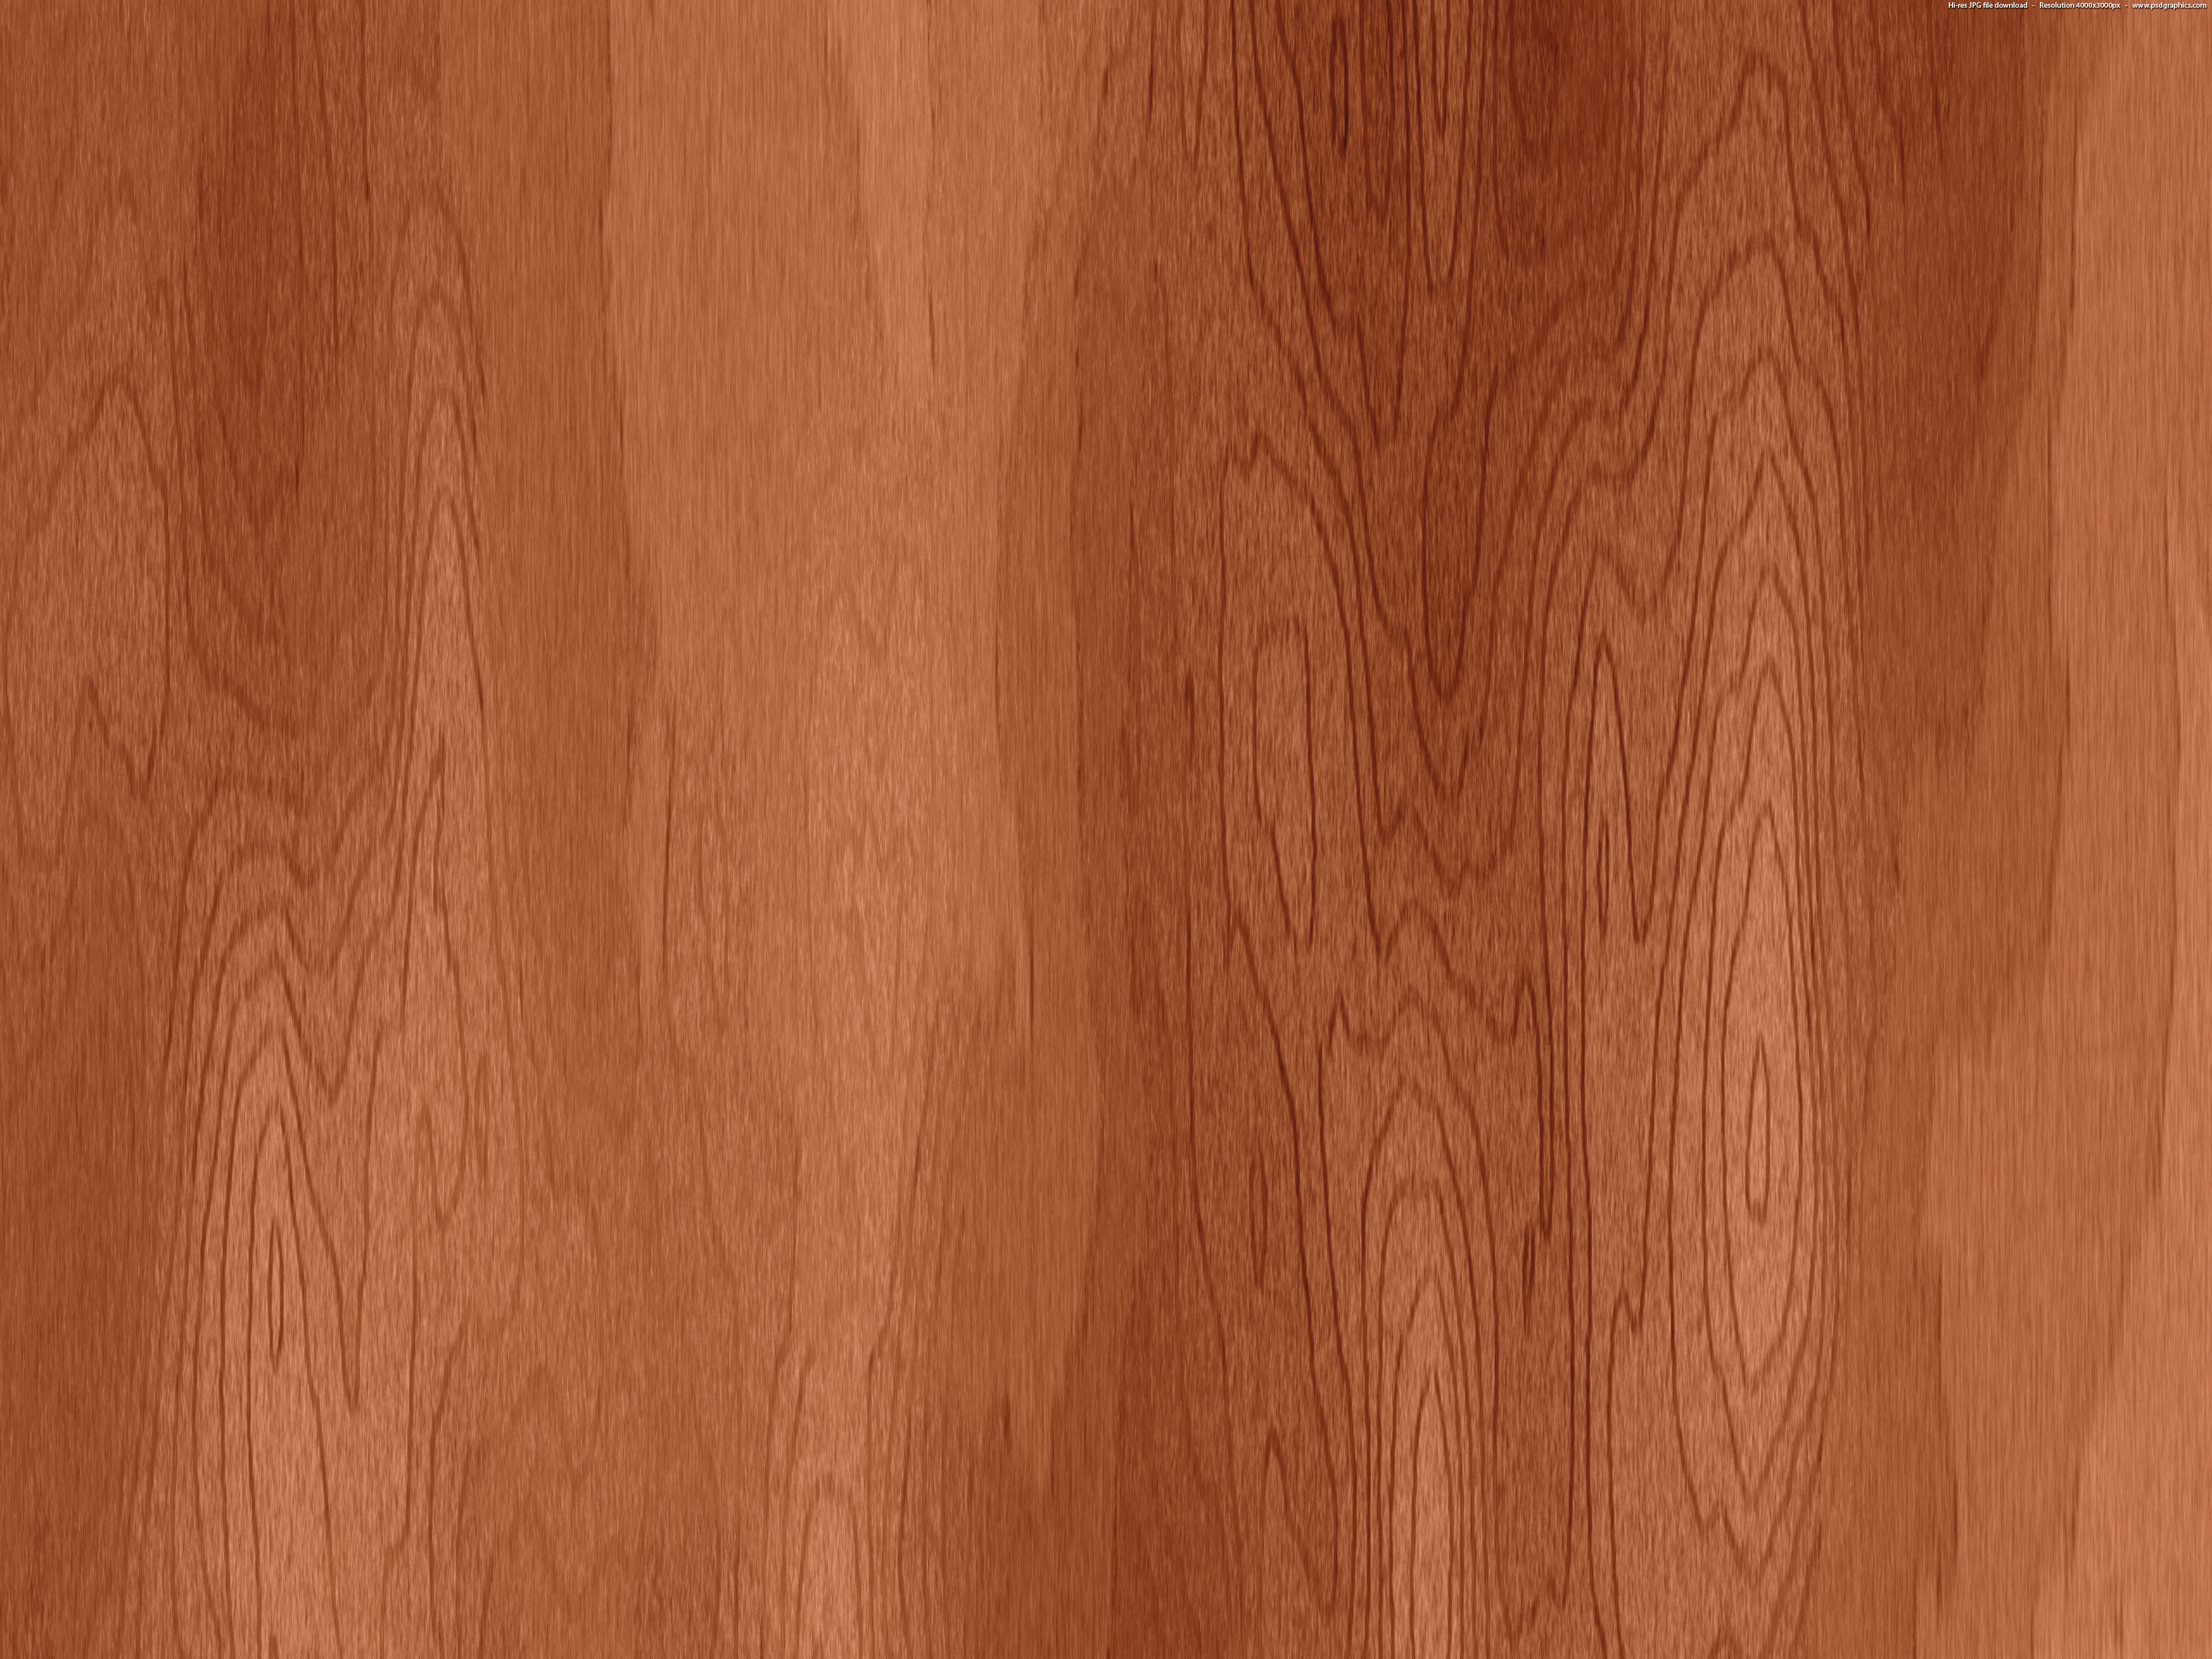 Wooden Floor Texture Dark Wood Brown Pattern Basketball 4000x3000